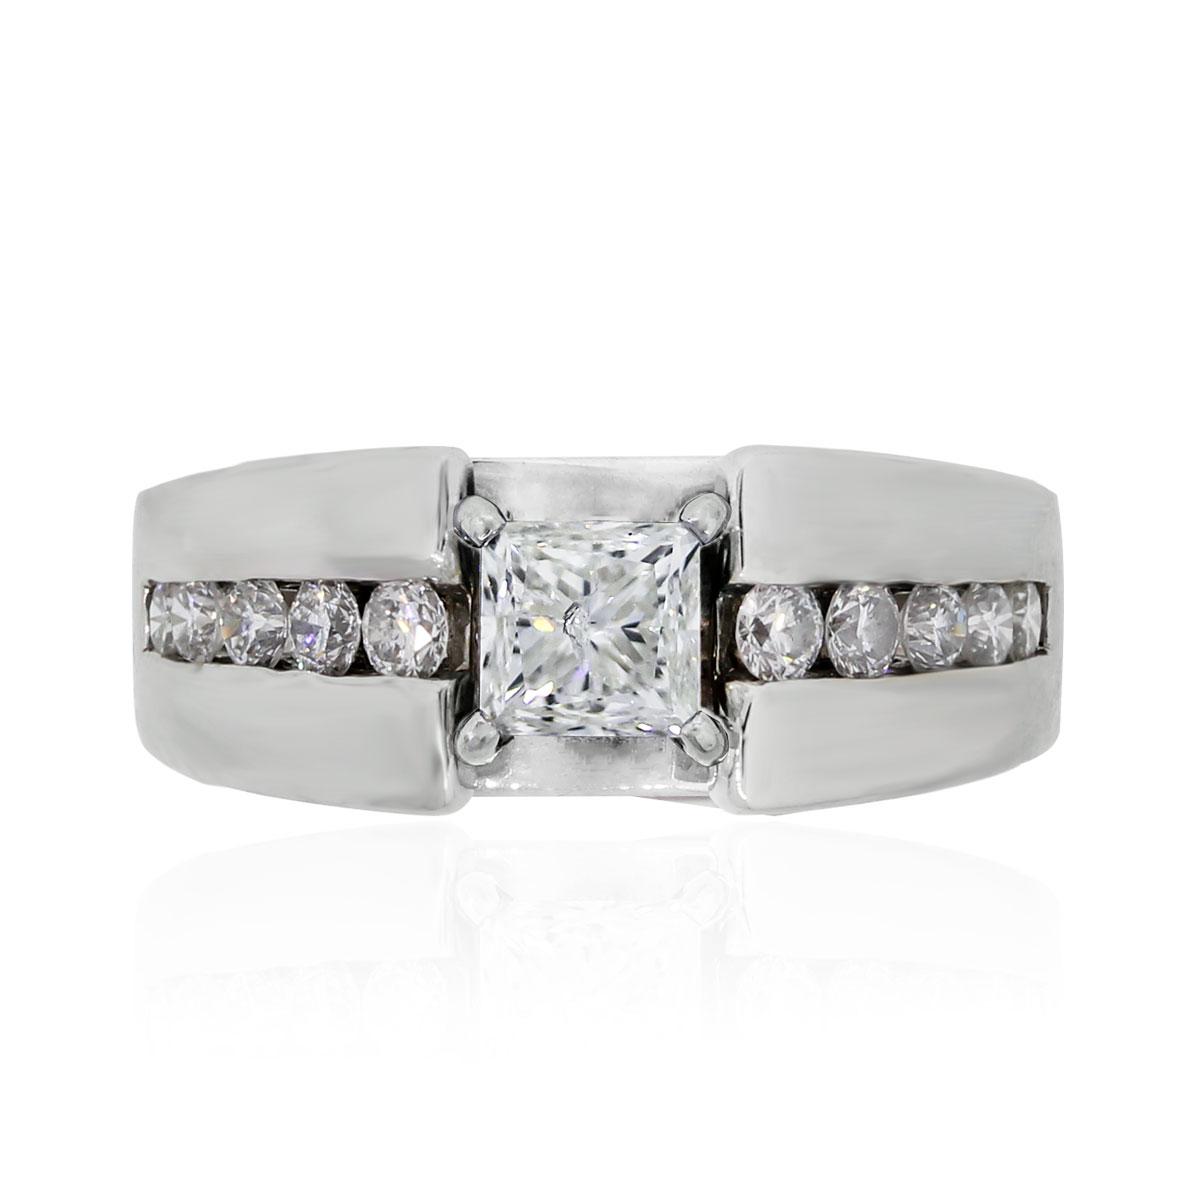 14k White Gold .95ct Princess Cut Diamond Engagement Ring